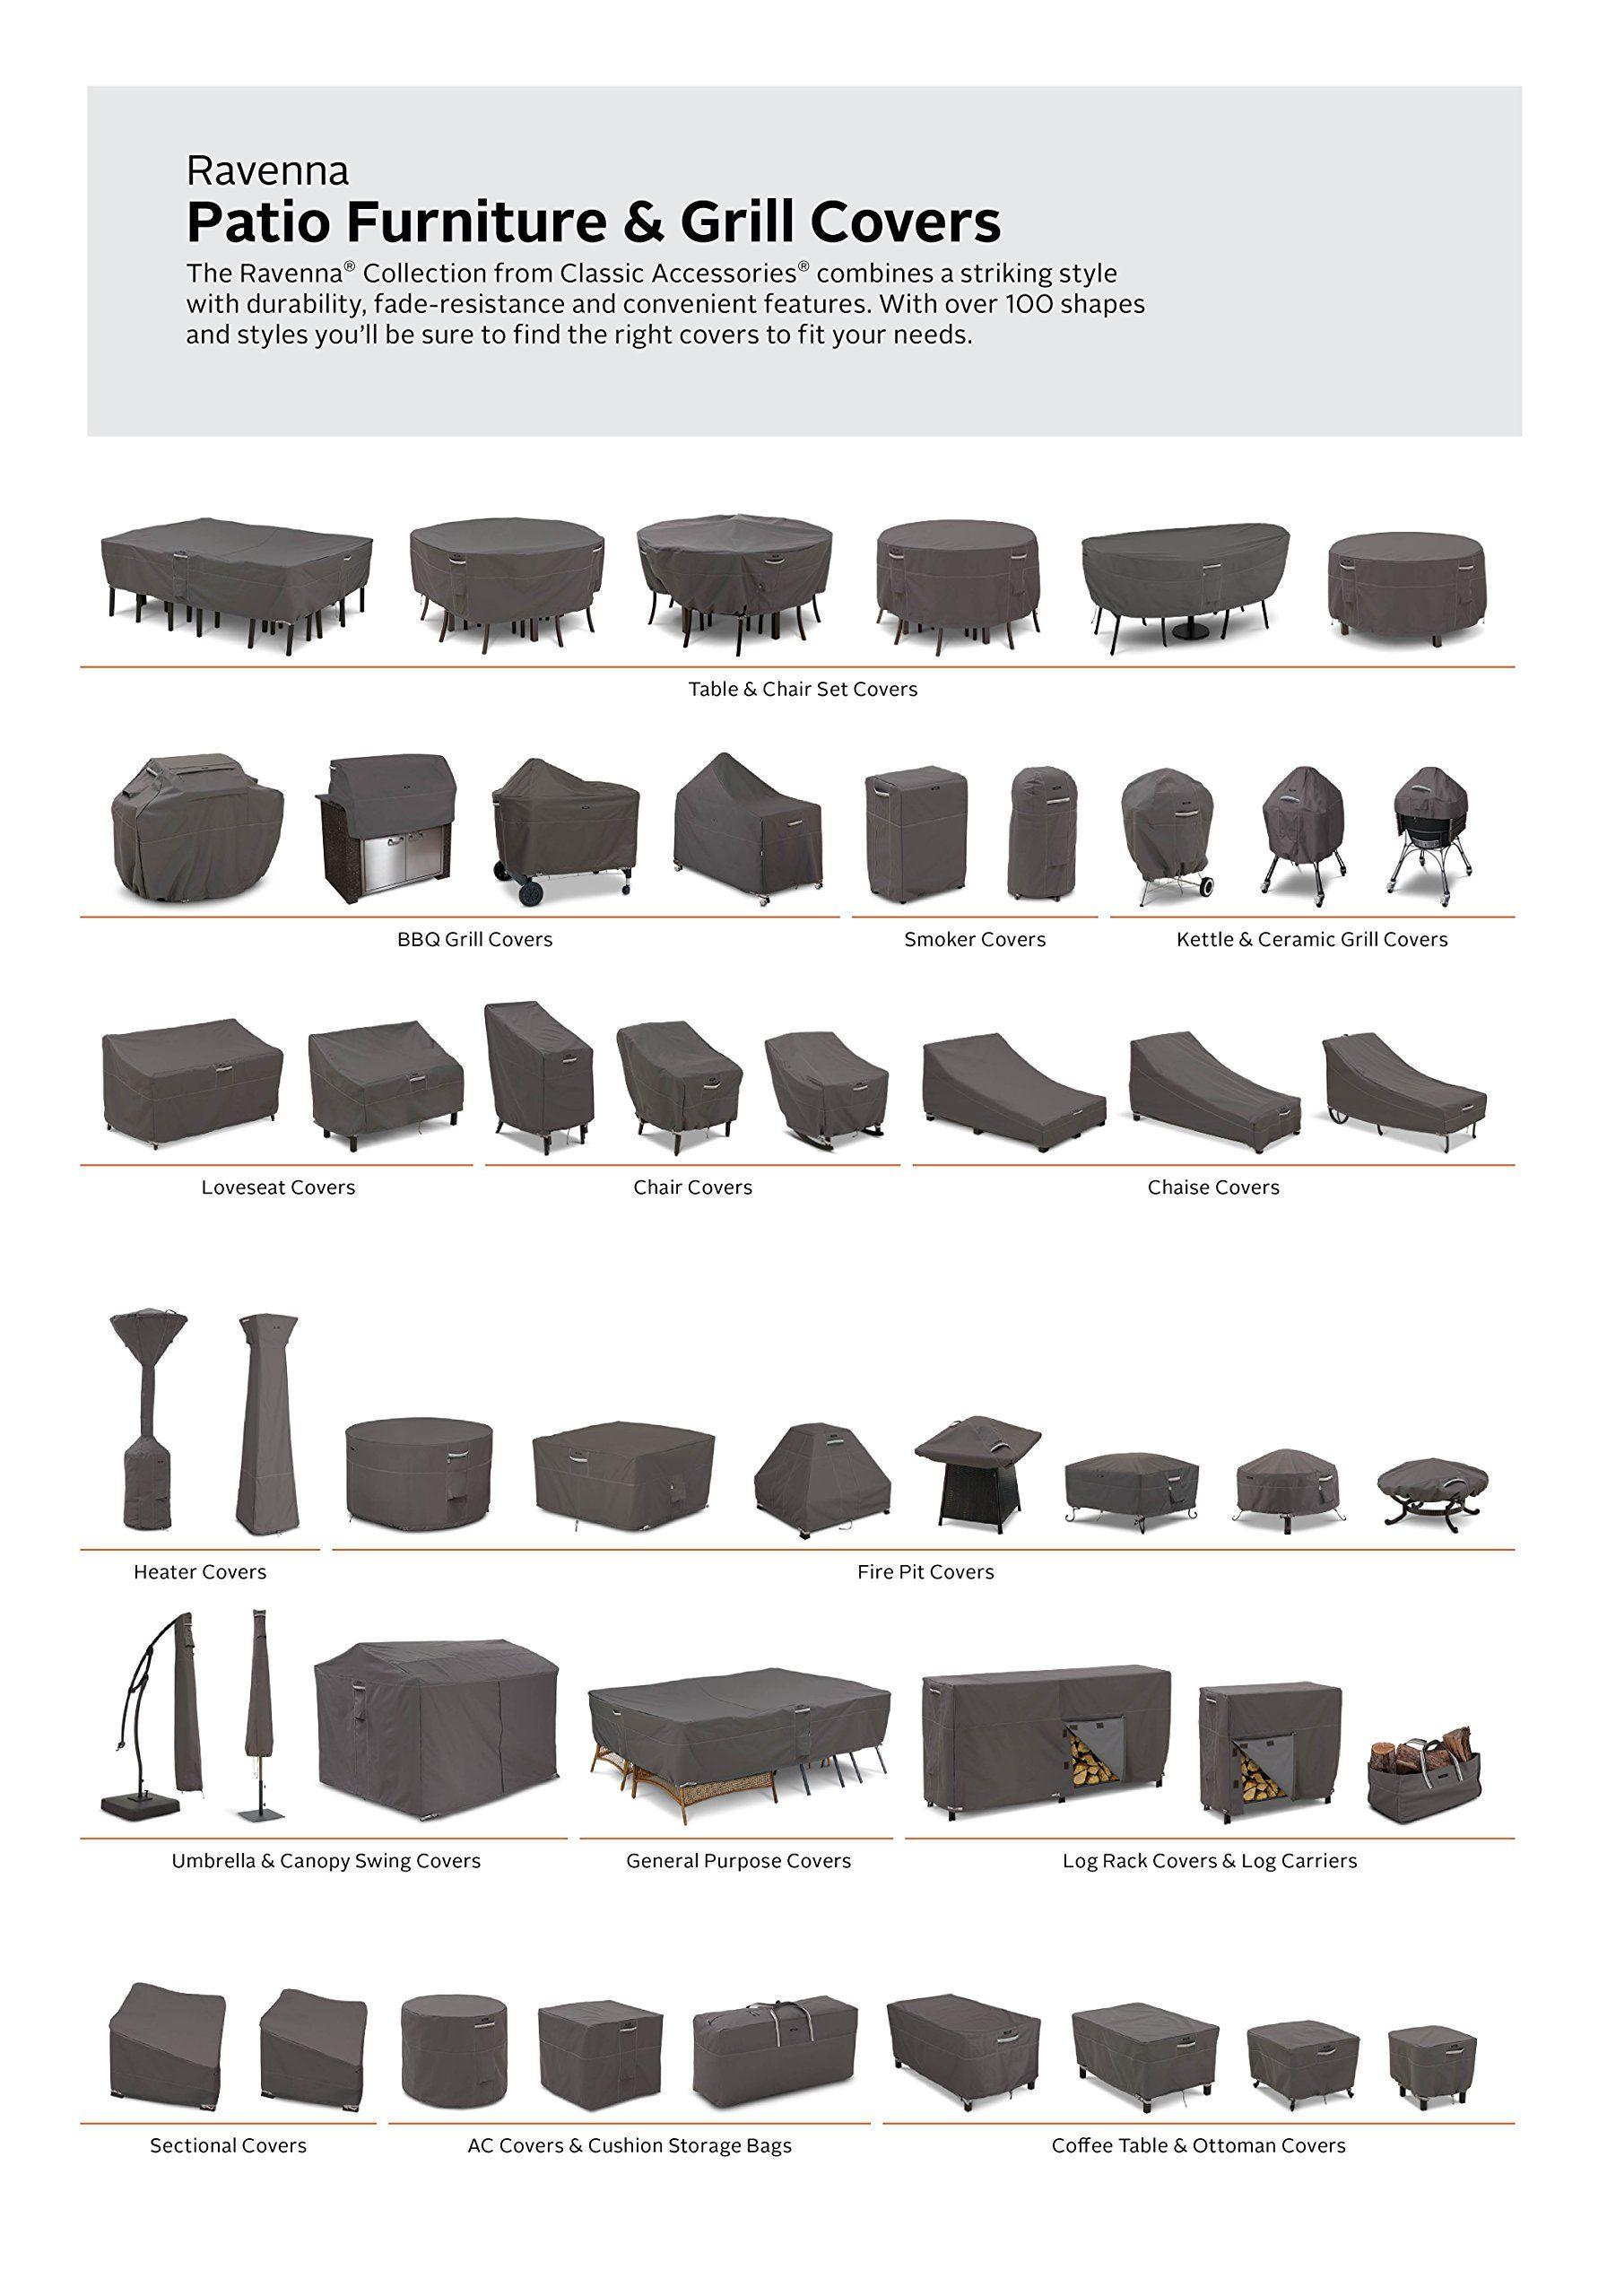 Classic Accessories Ravenna Patio Bench Cover Premium Outdoor